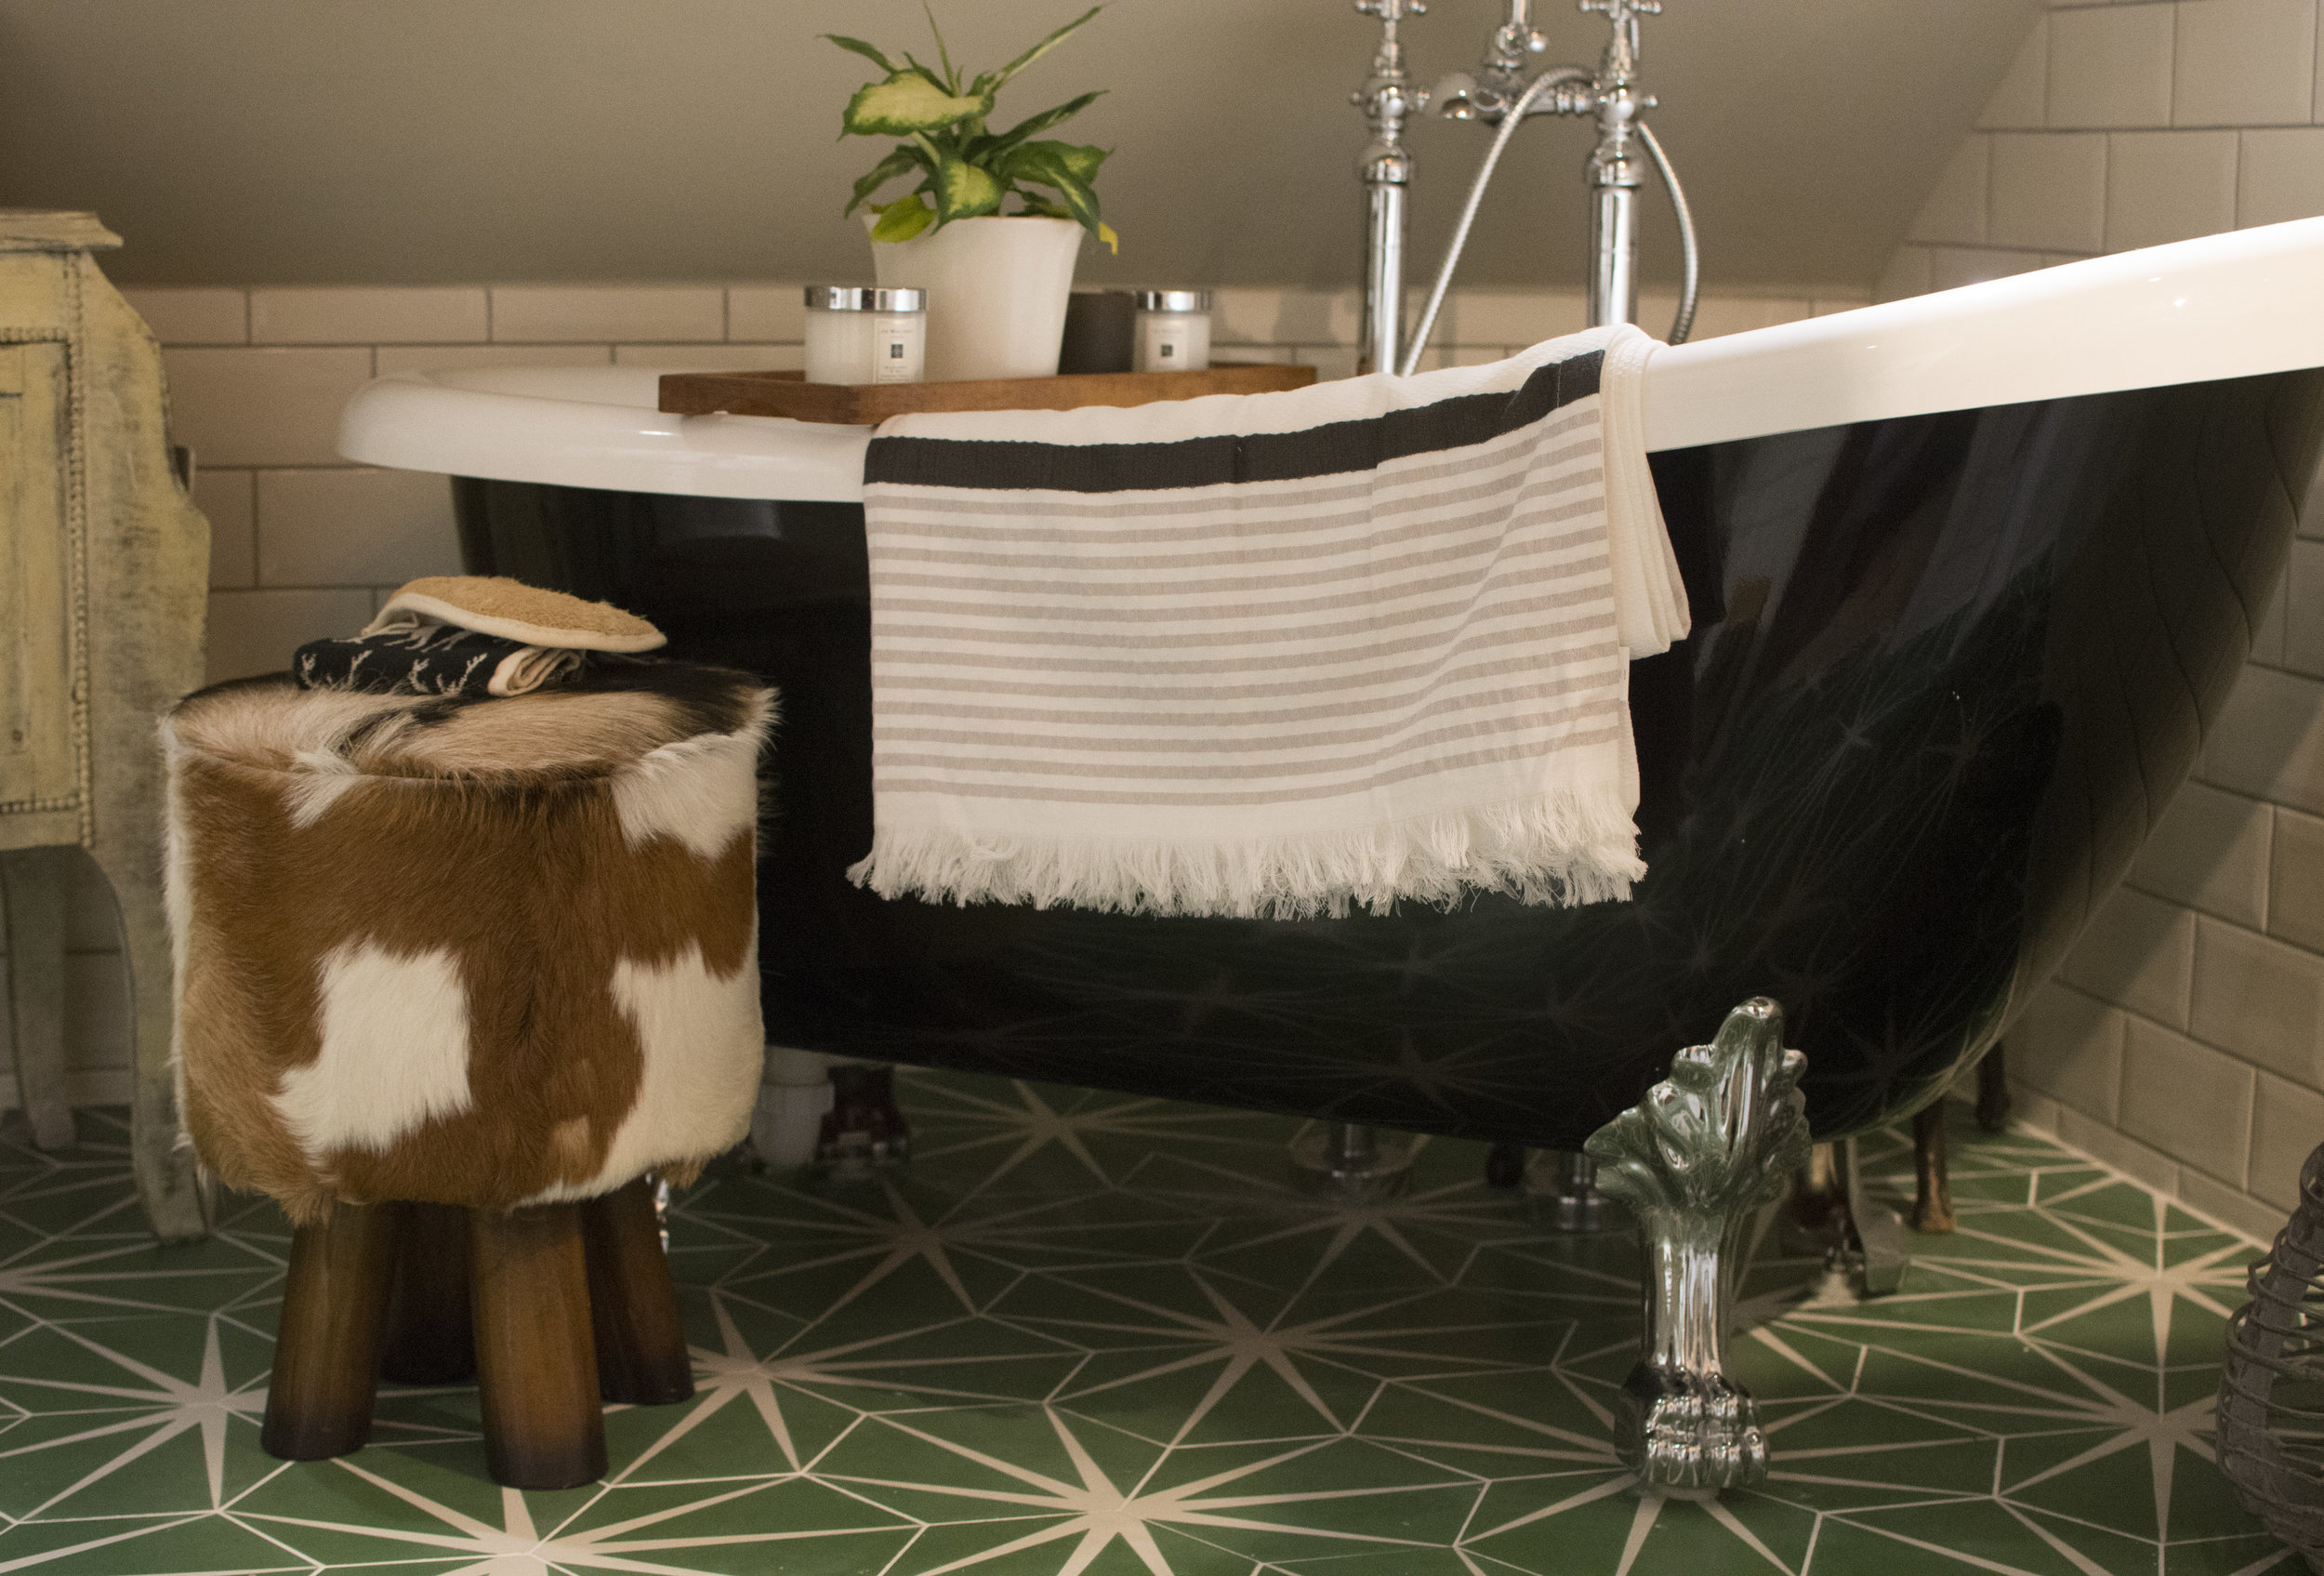 Maroc Towel Hanging over my bath tub.